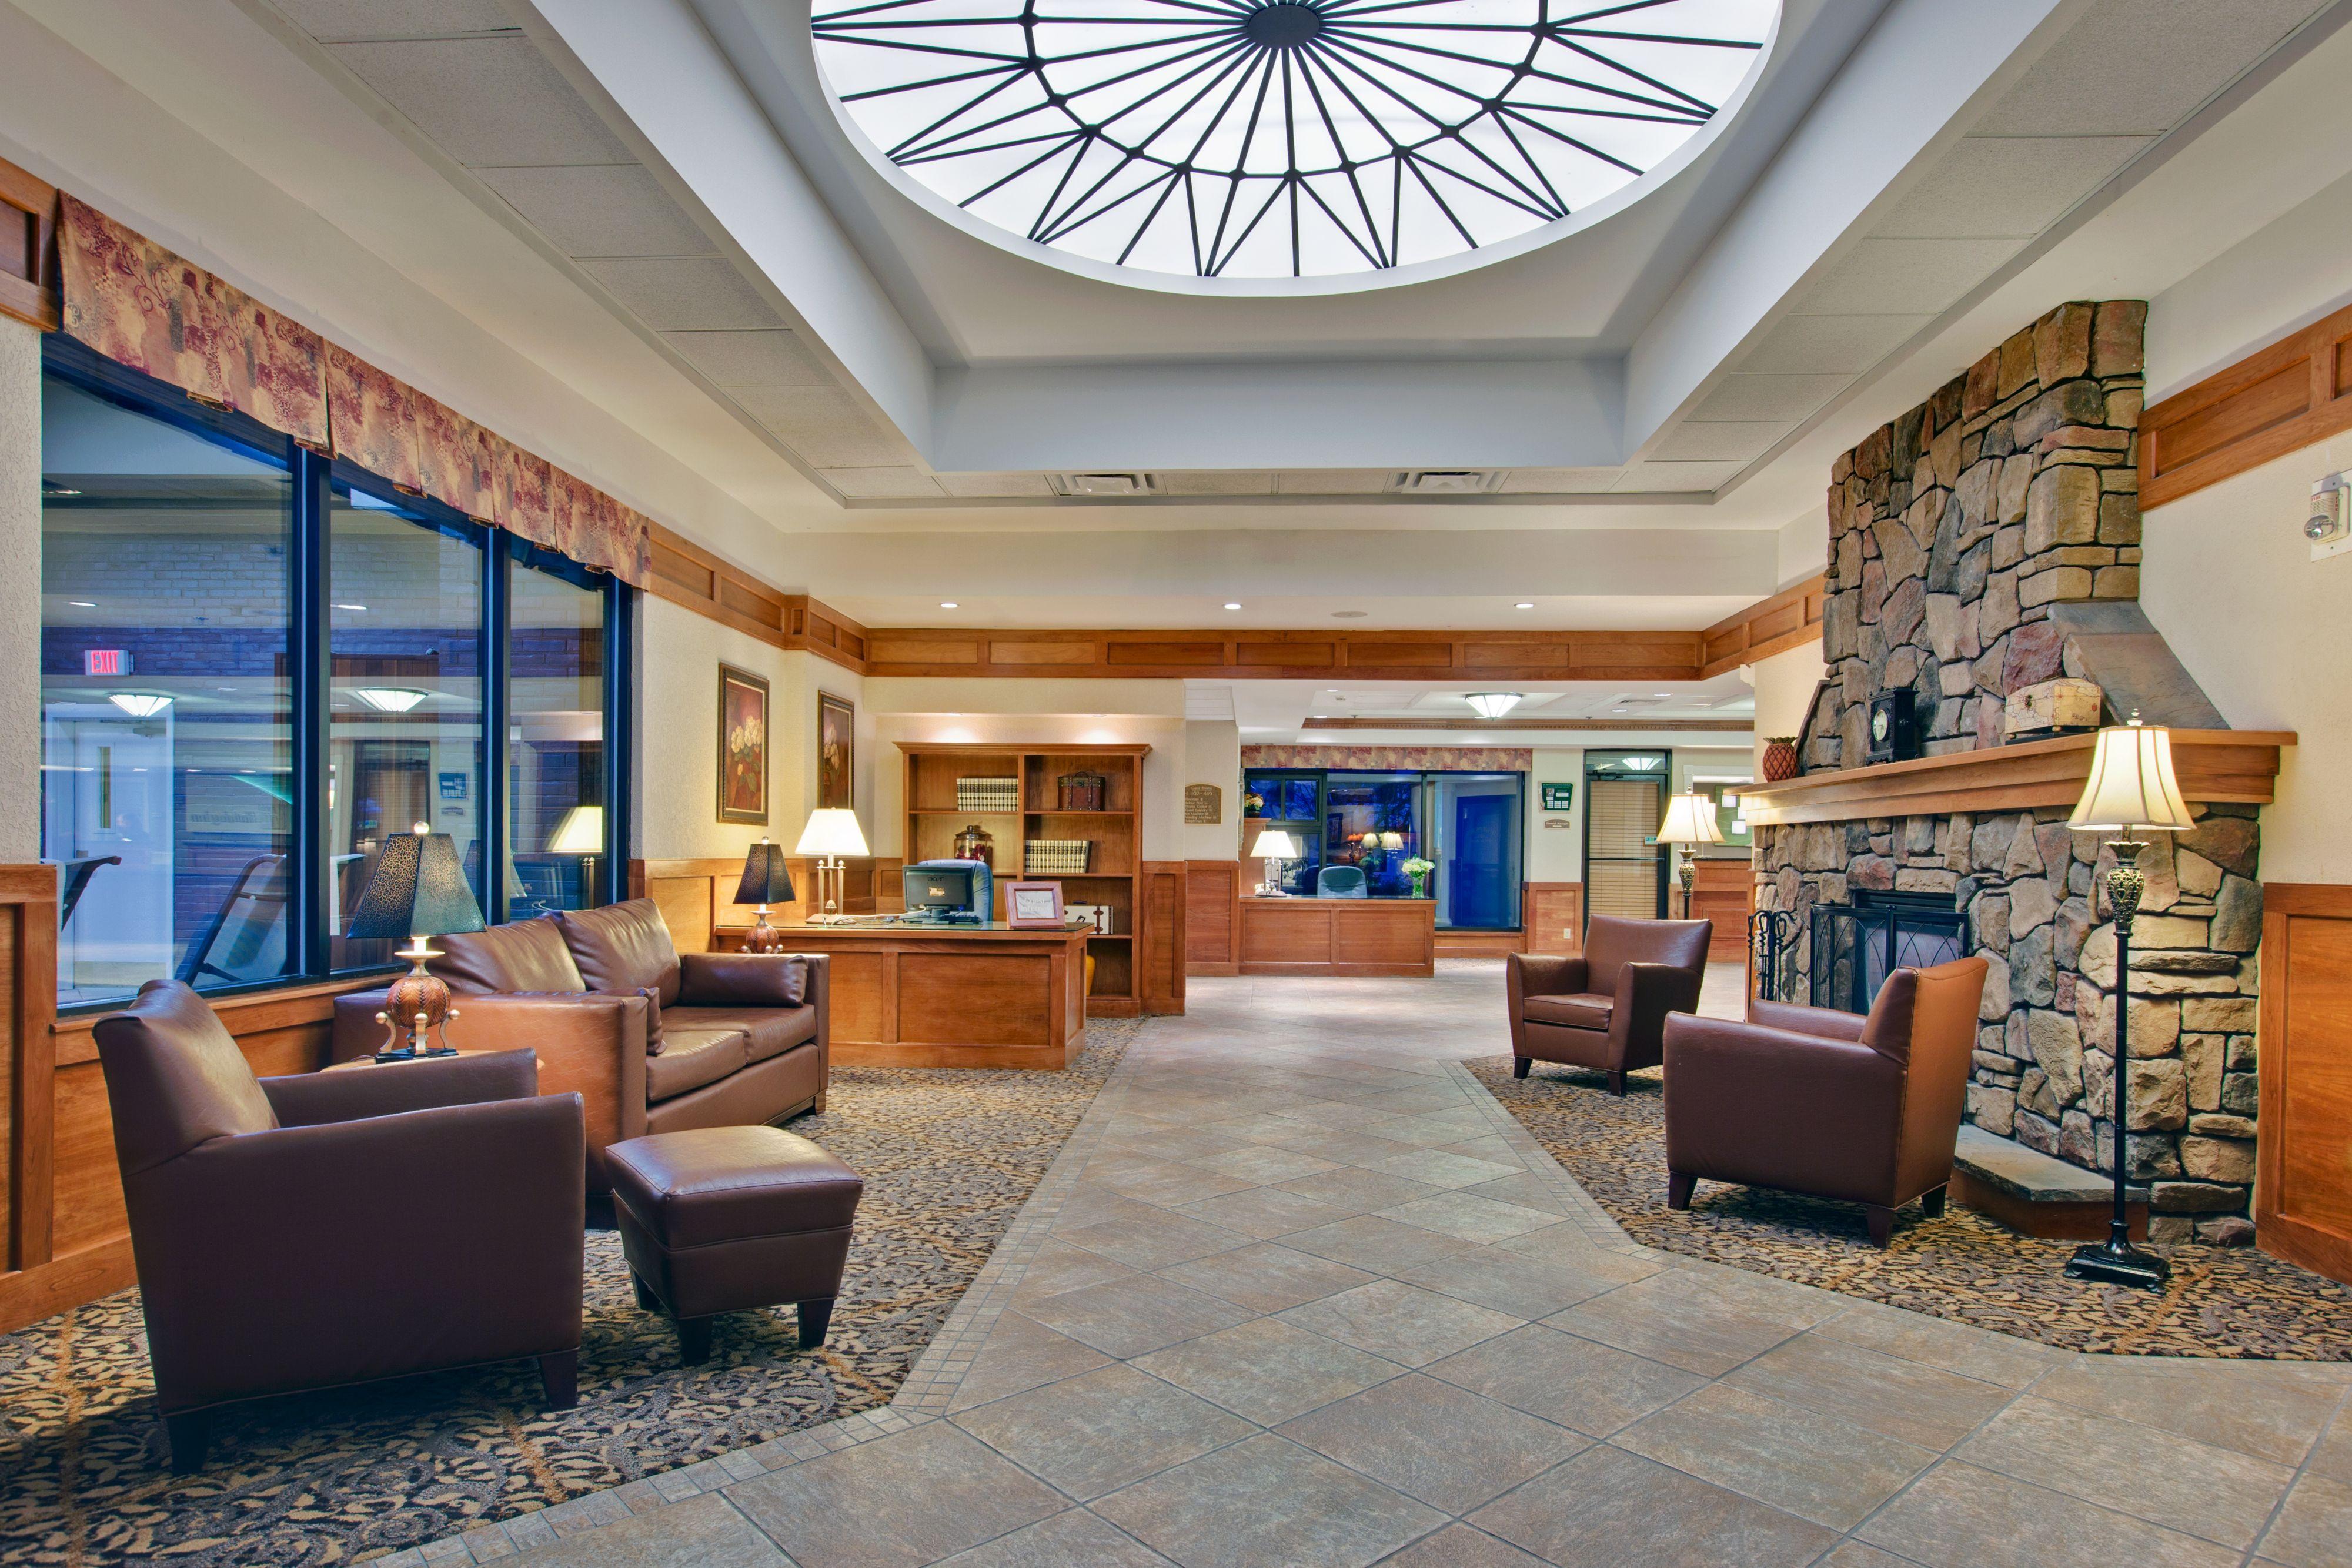 Holiday Inn Burlington image 4